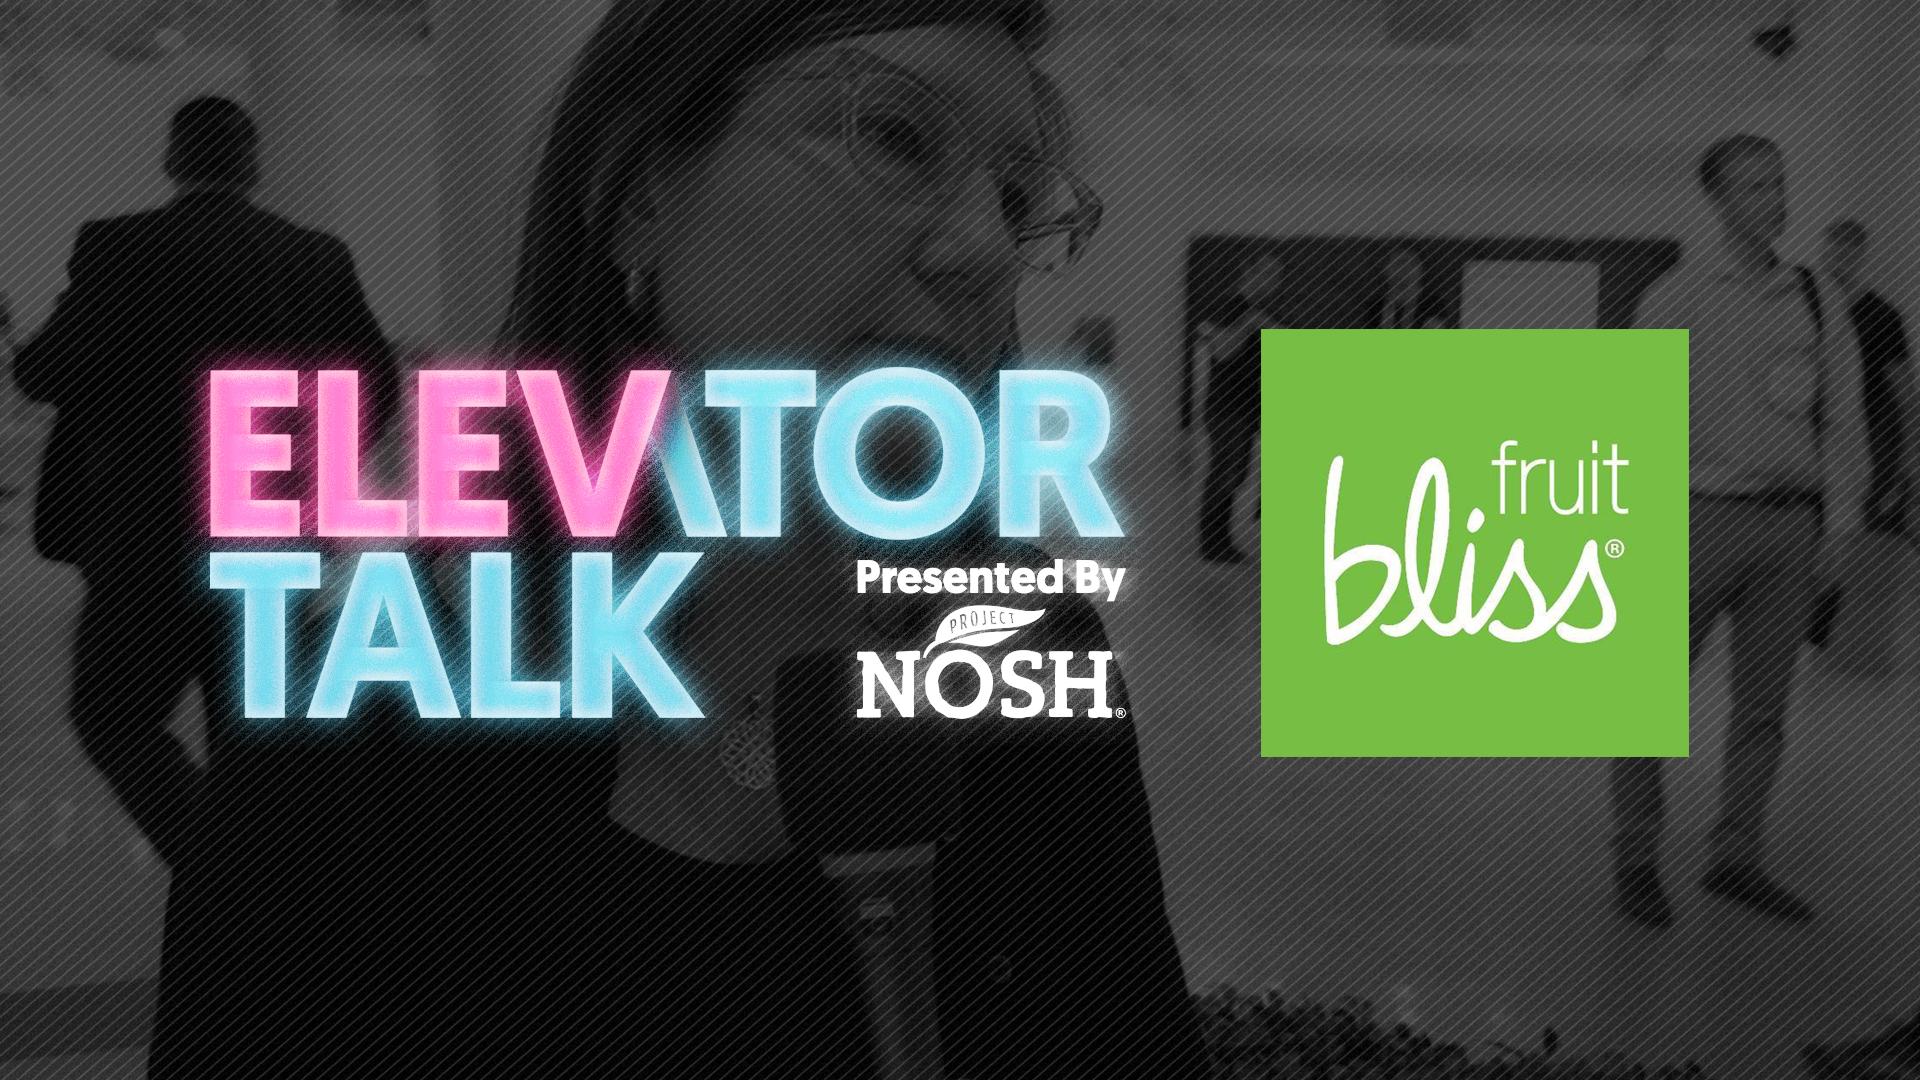 PN-Elevator-Talk_Fruit-Bliss_Splash